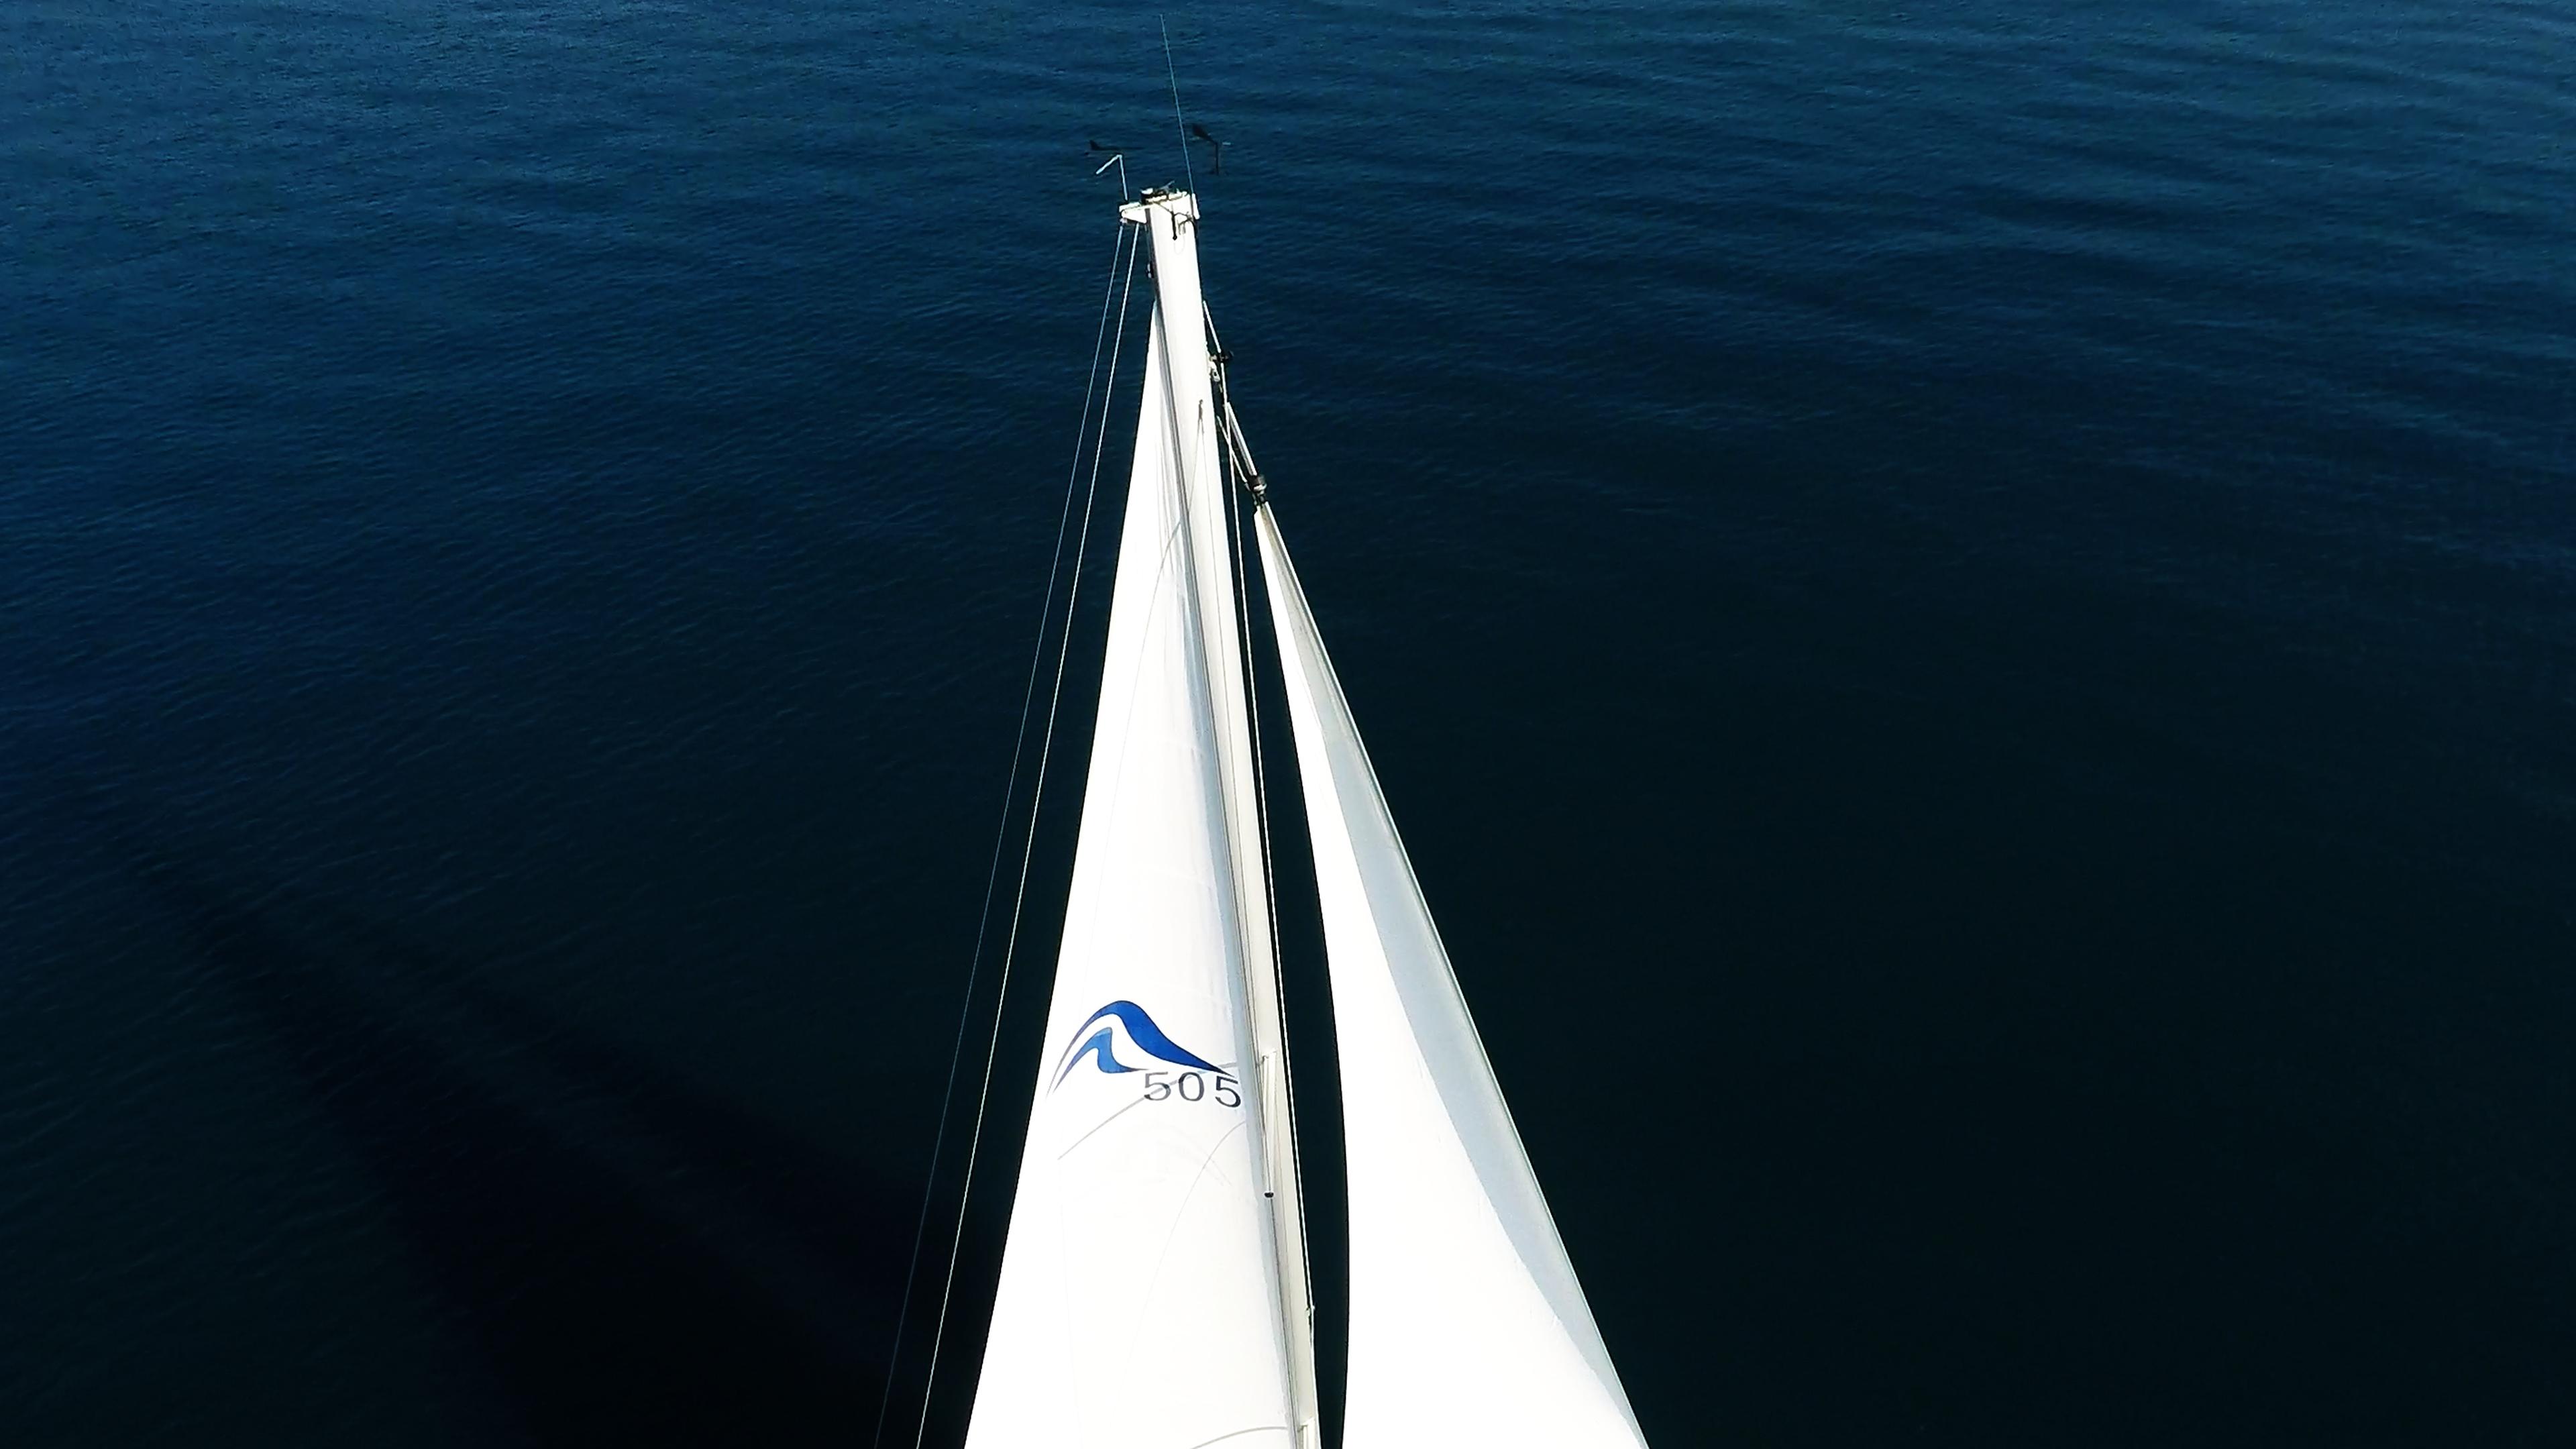 sailing yacht top of mast with main sail and genoa on sailing yacht